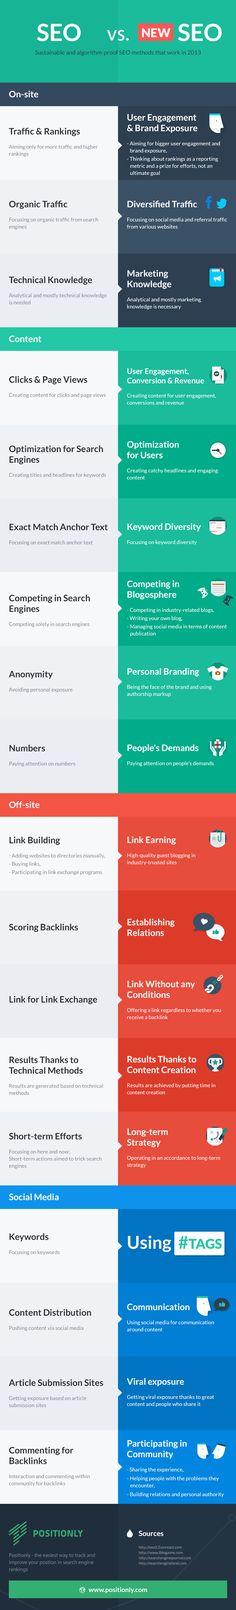 SEO vs nuevo SEO #infografia #infographic #seo